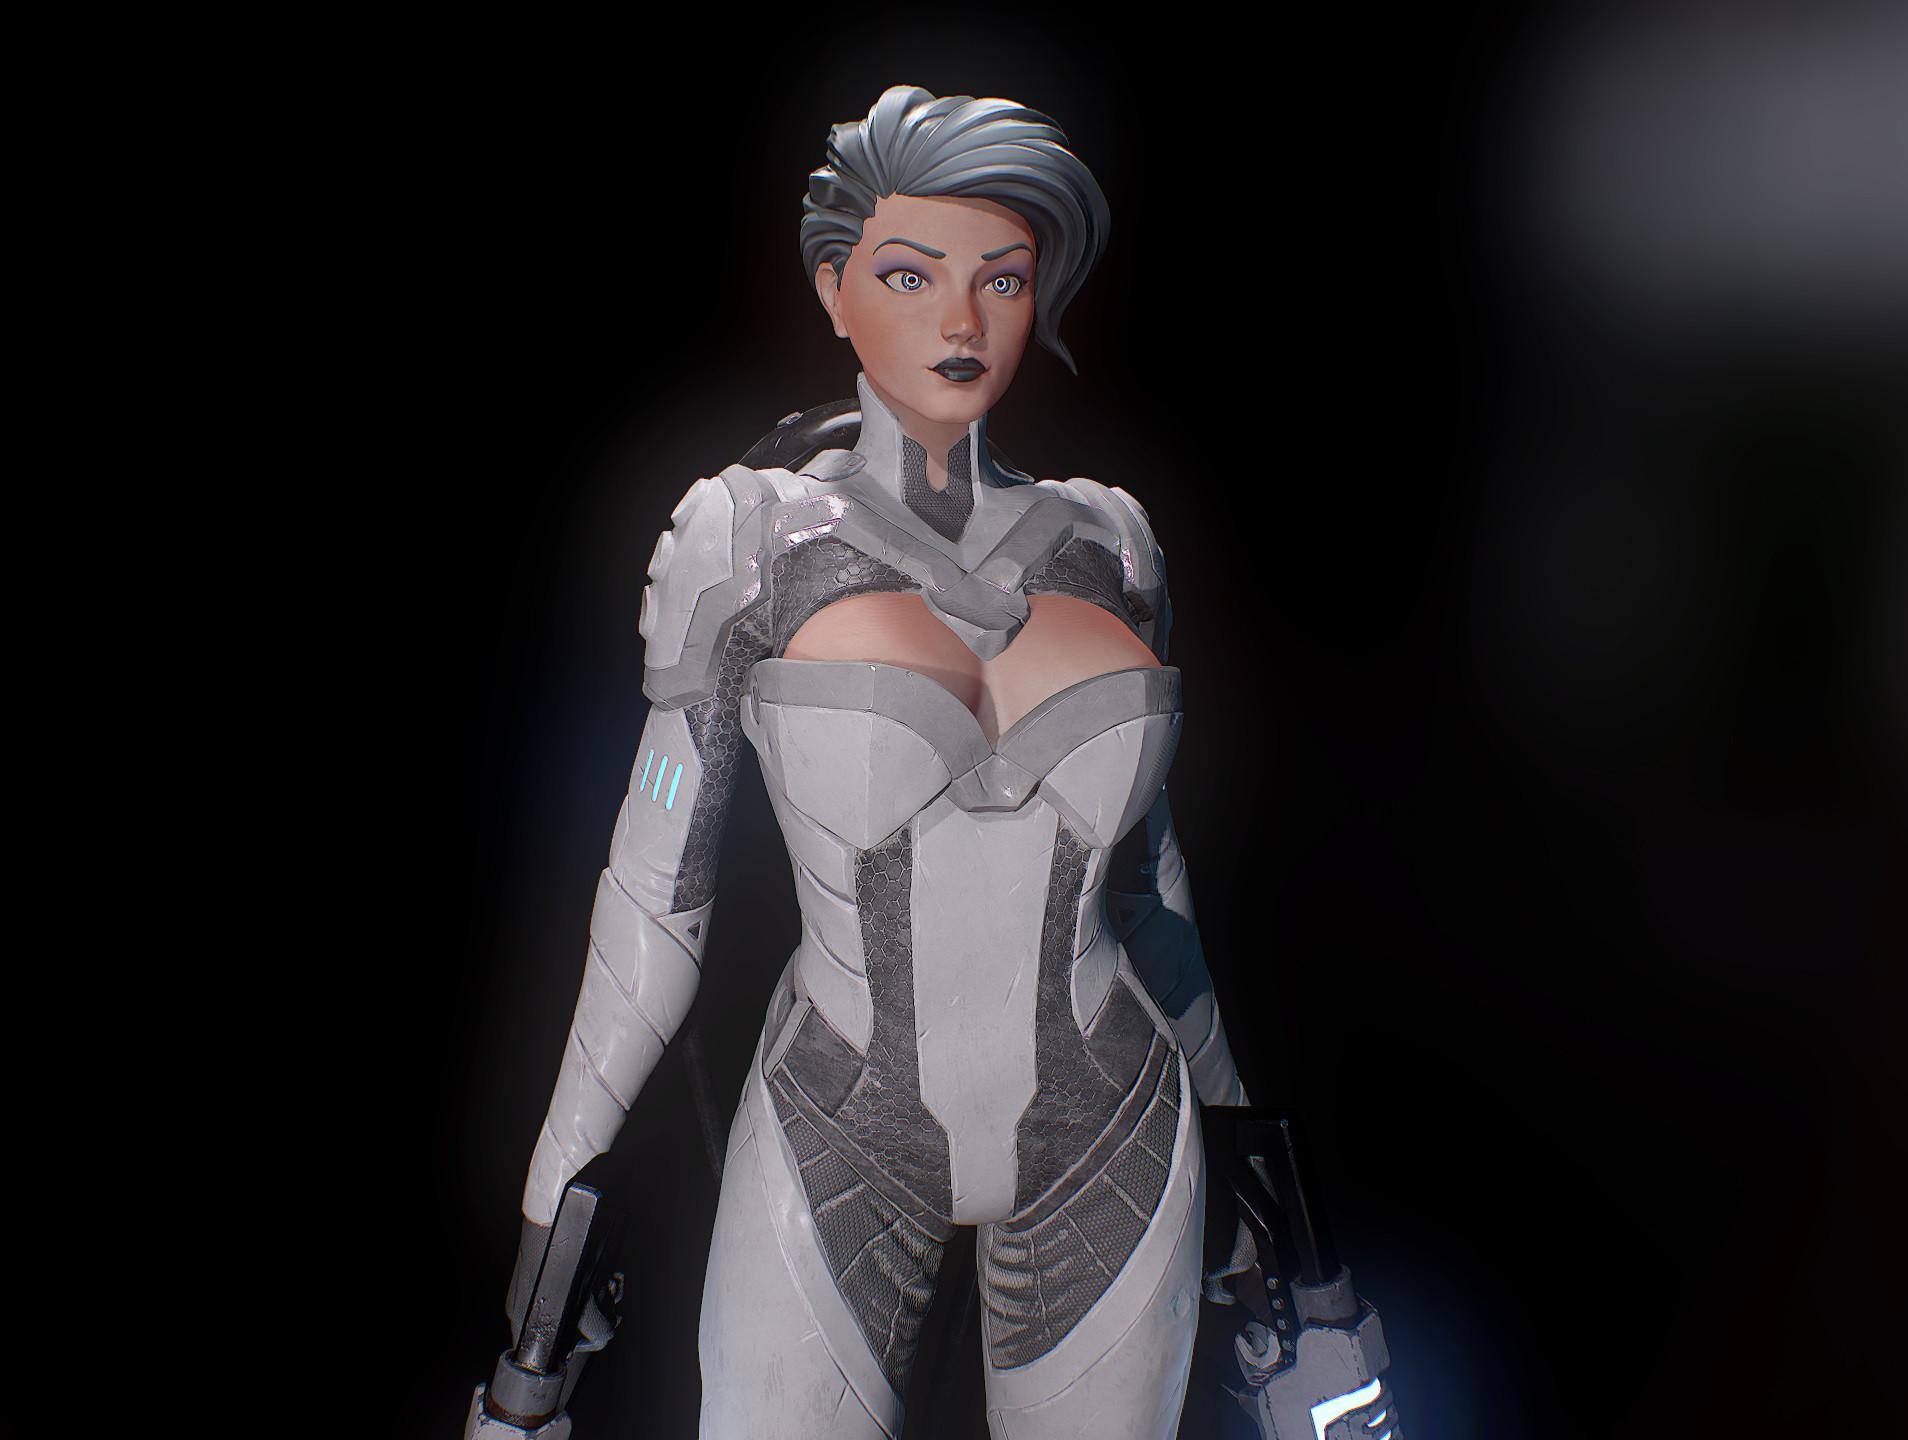 Eren ozel cinder scifi costume design 30 161206